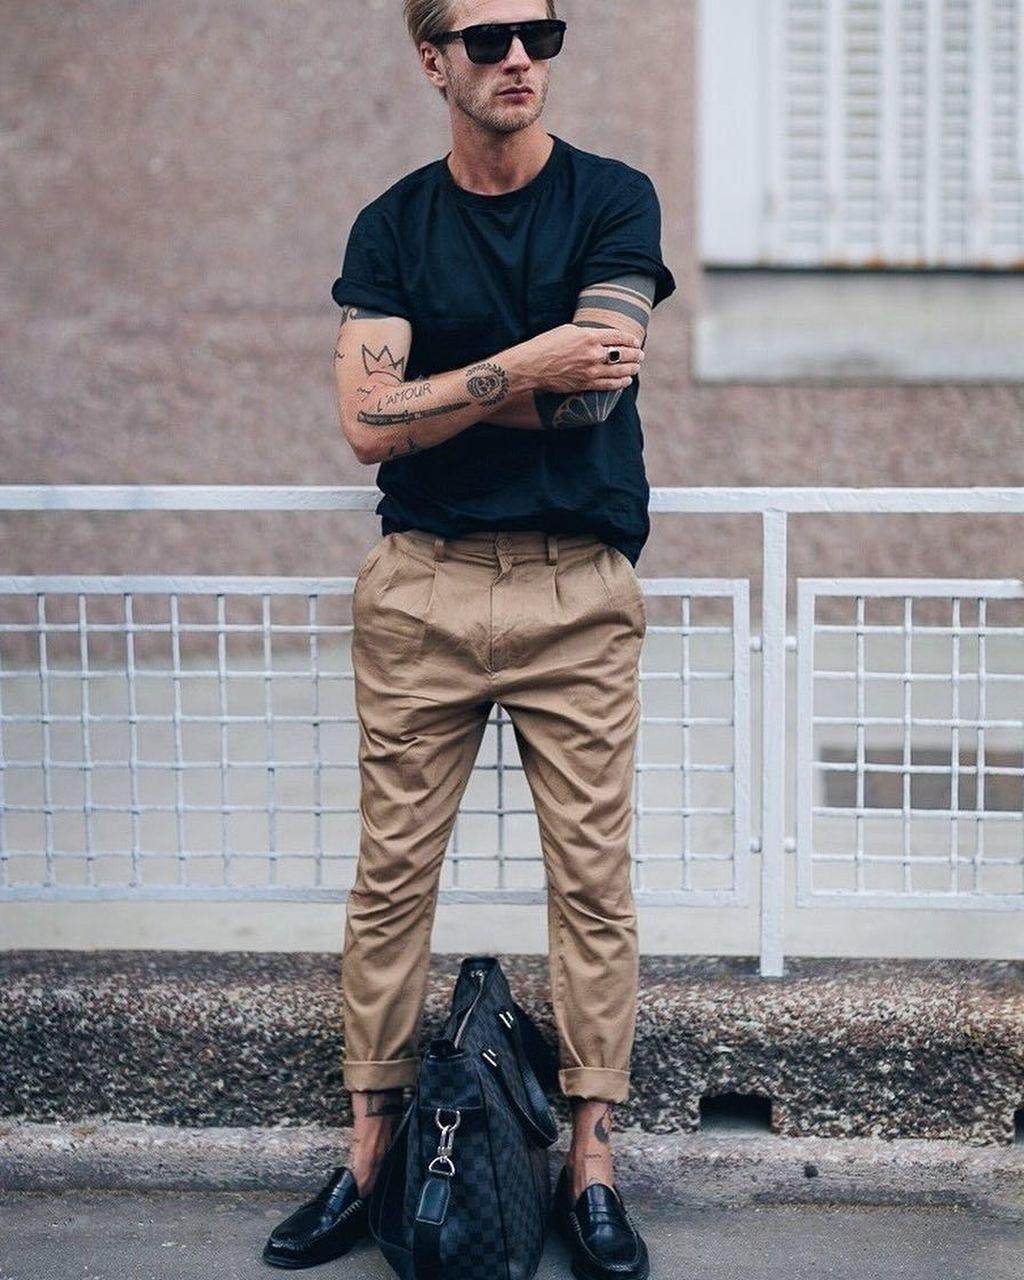 fullfitwear.jpg